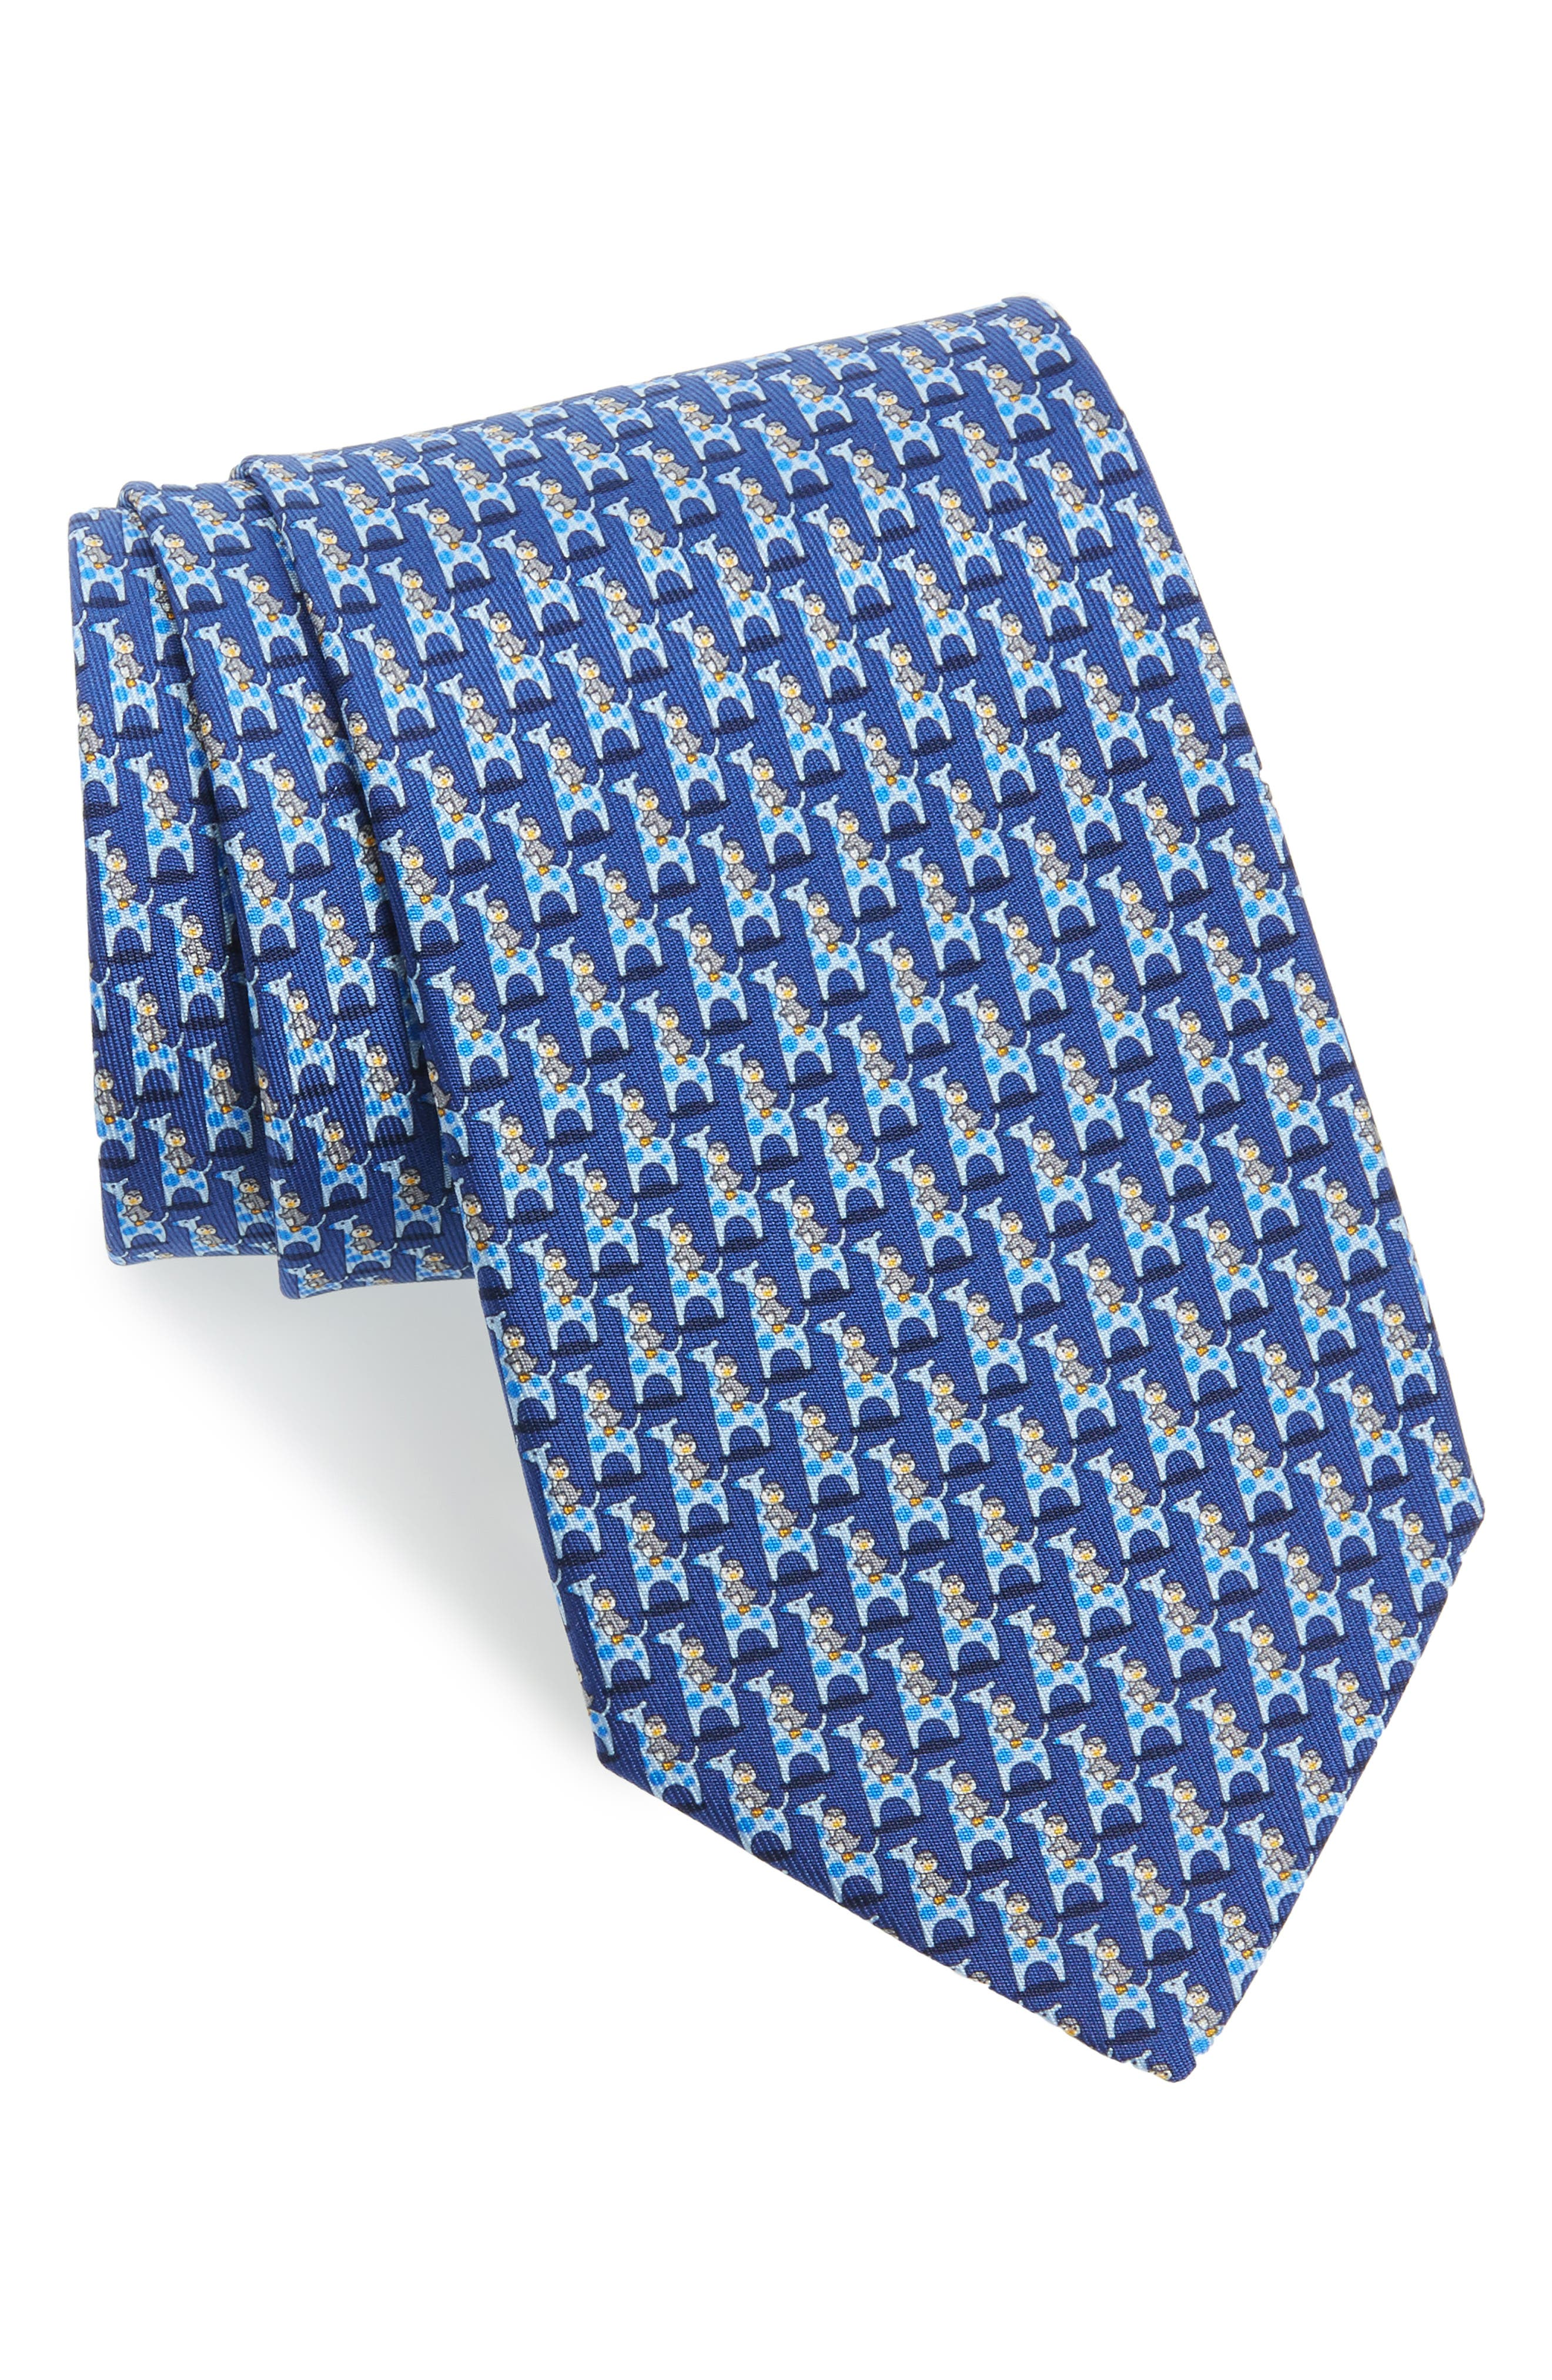 Salvatore Ferragamo Puffin & Giraffe Silk Tie